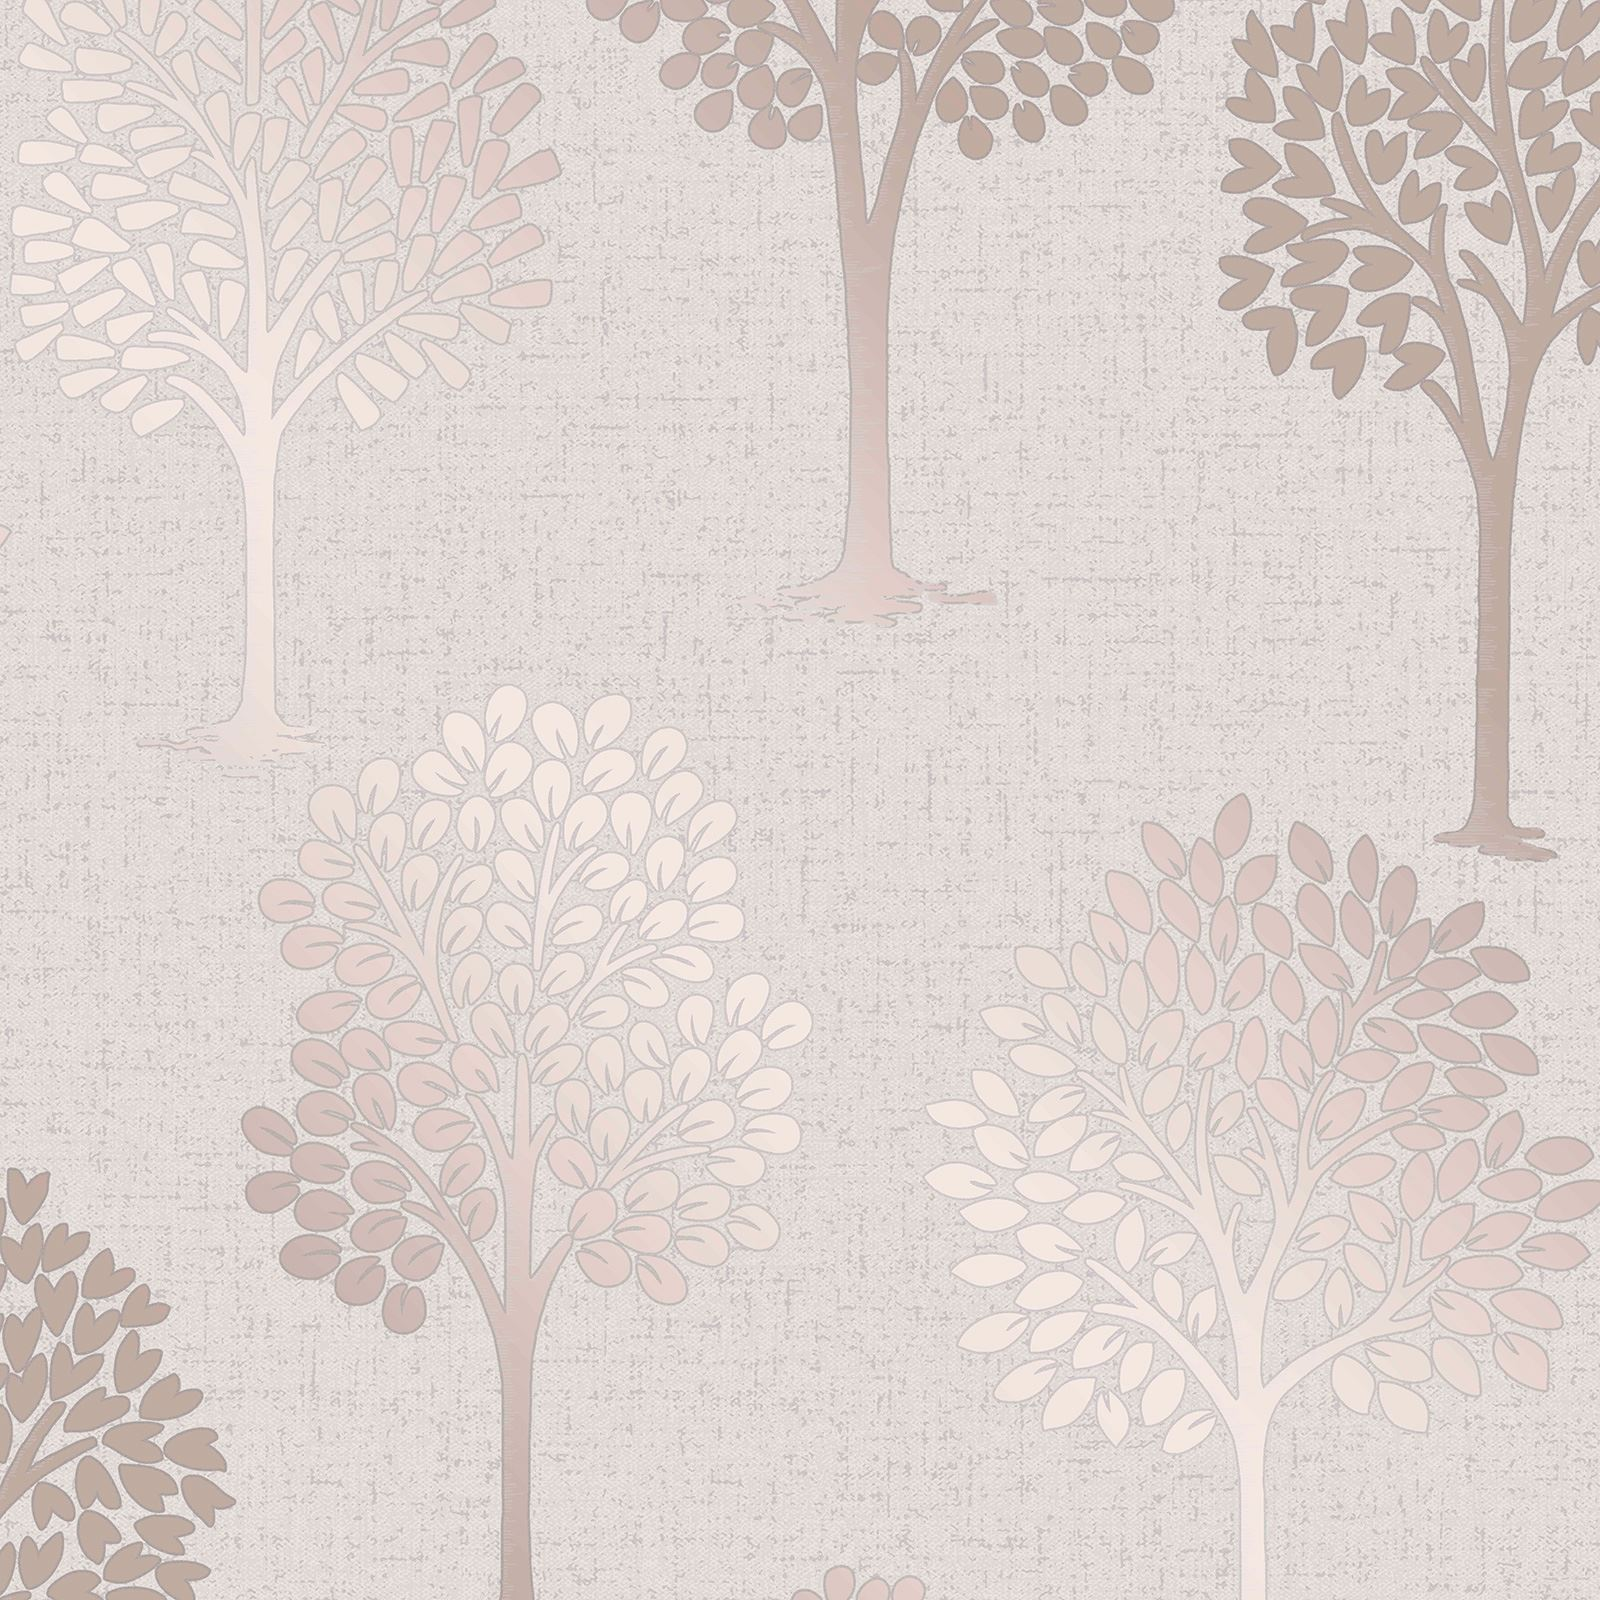 Download Wallpaper Marble Light Pink - 74924f4c-560a-4182-8bda-90620bf6d9fd  Pic_4857.jpg